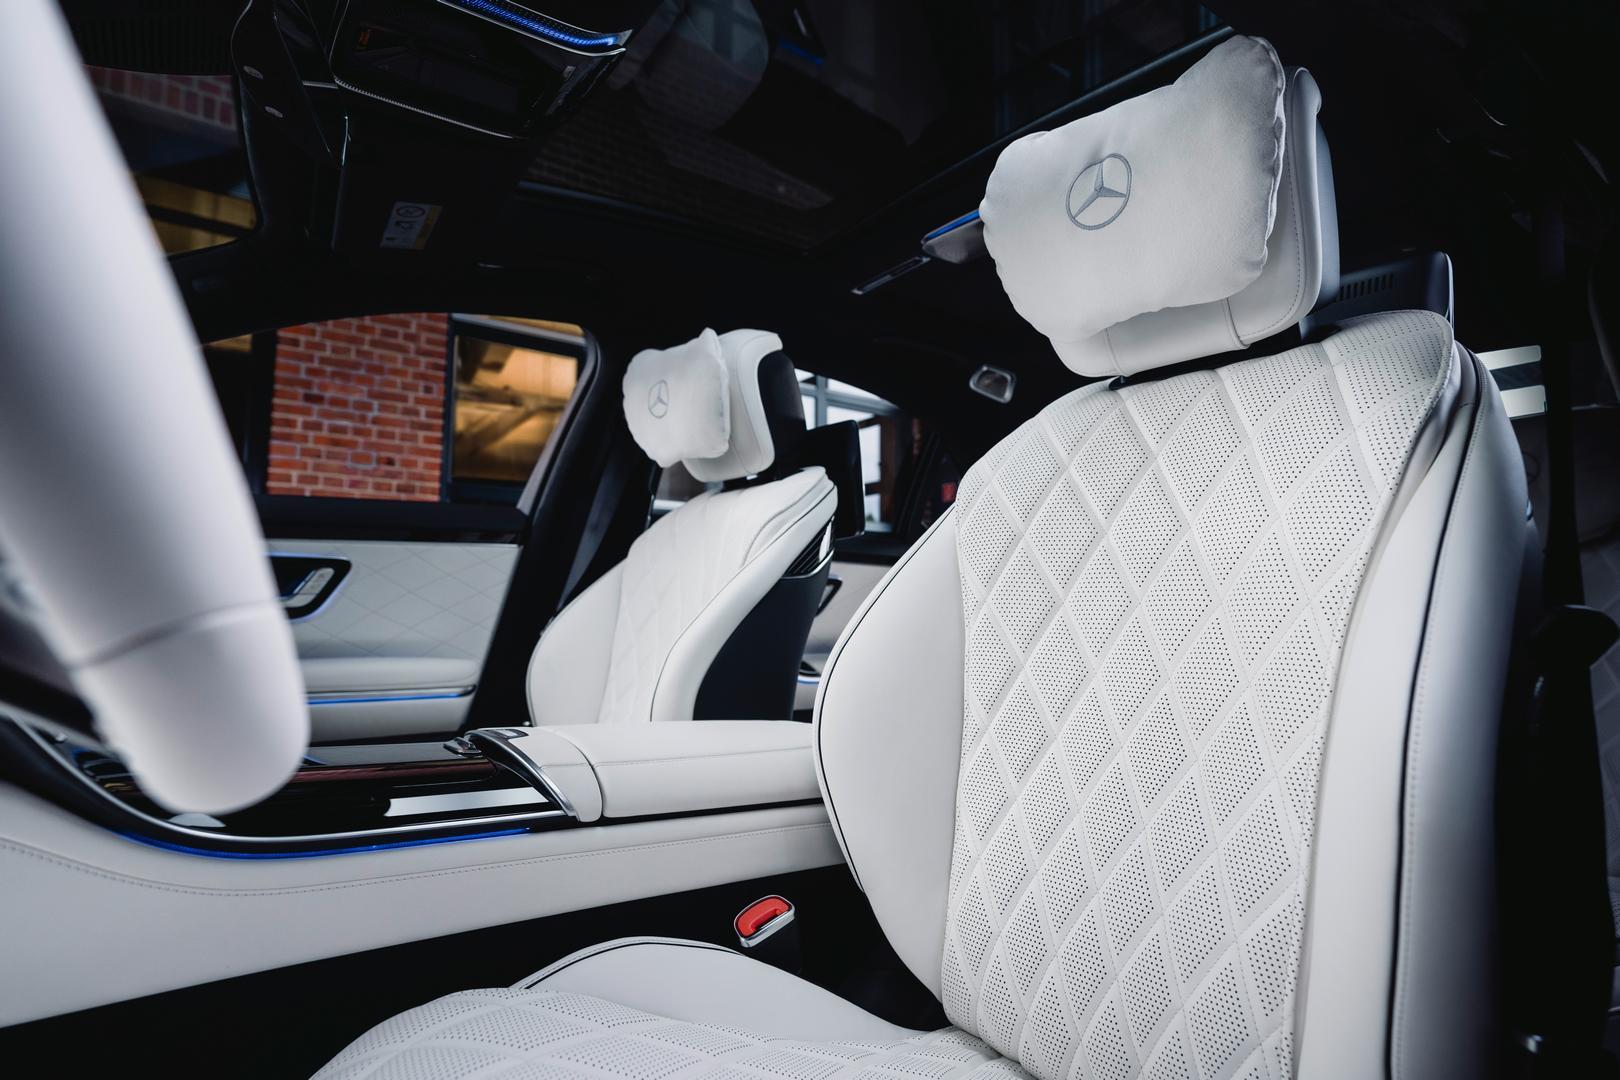 2022 Mercedes-Benz S580 interior